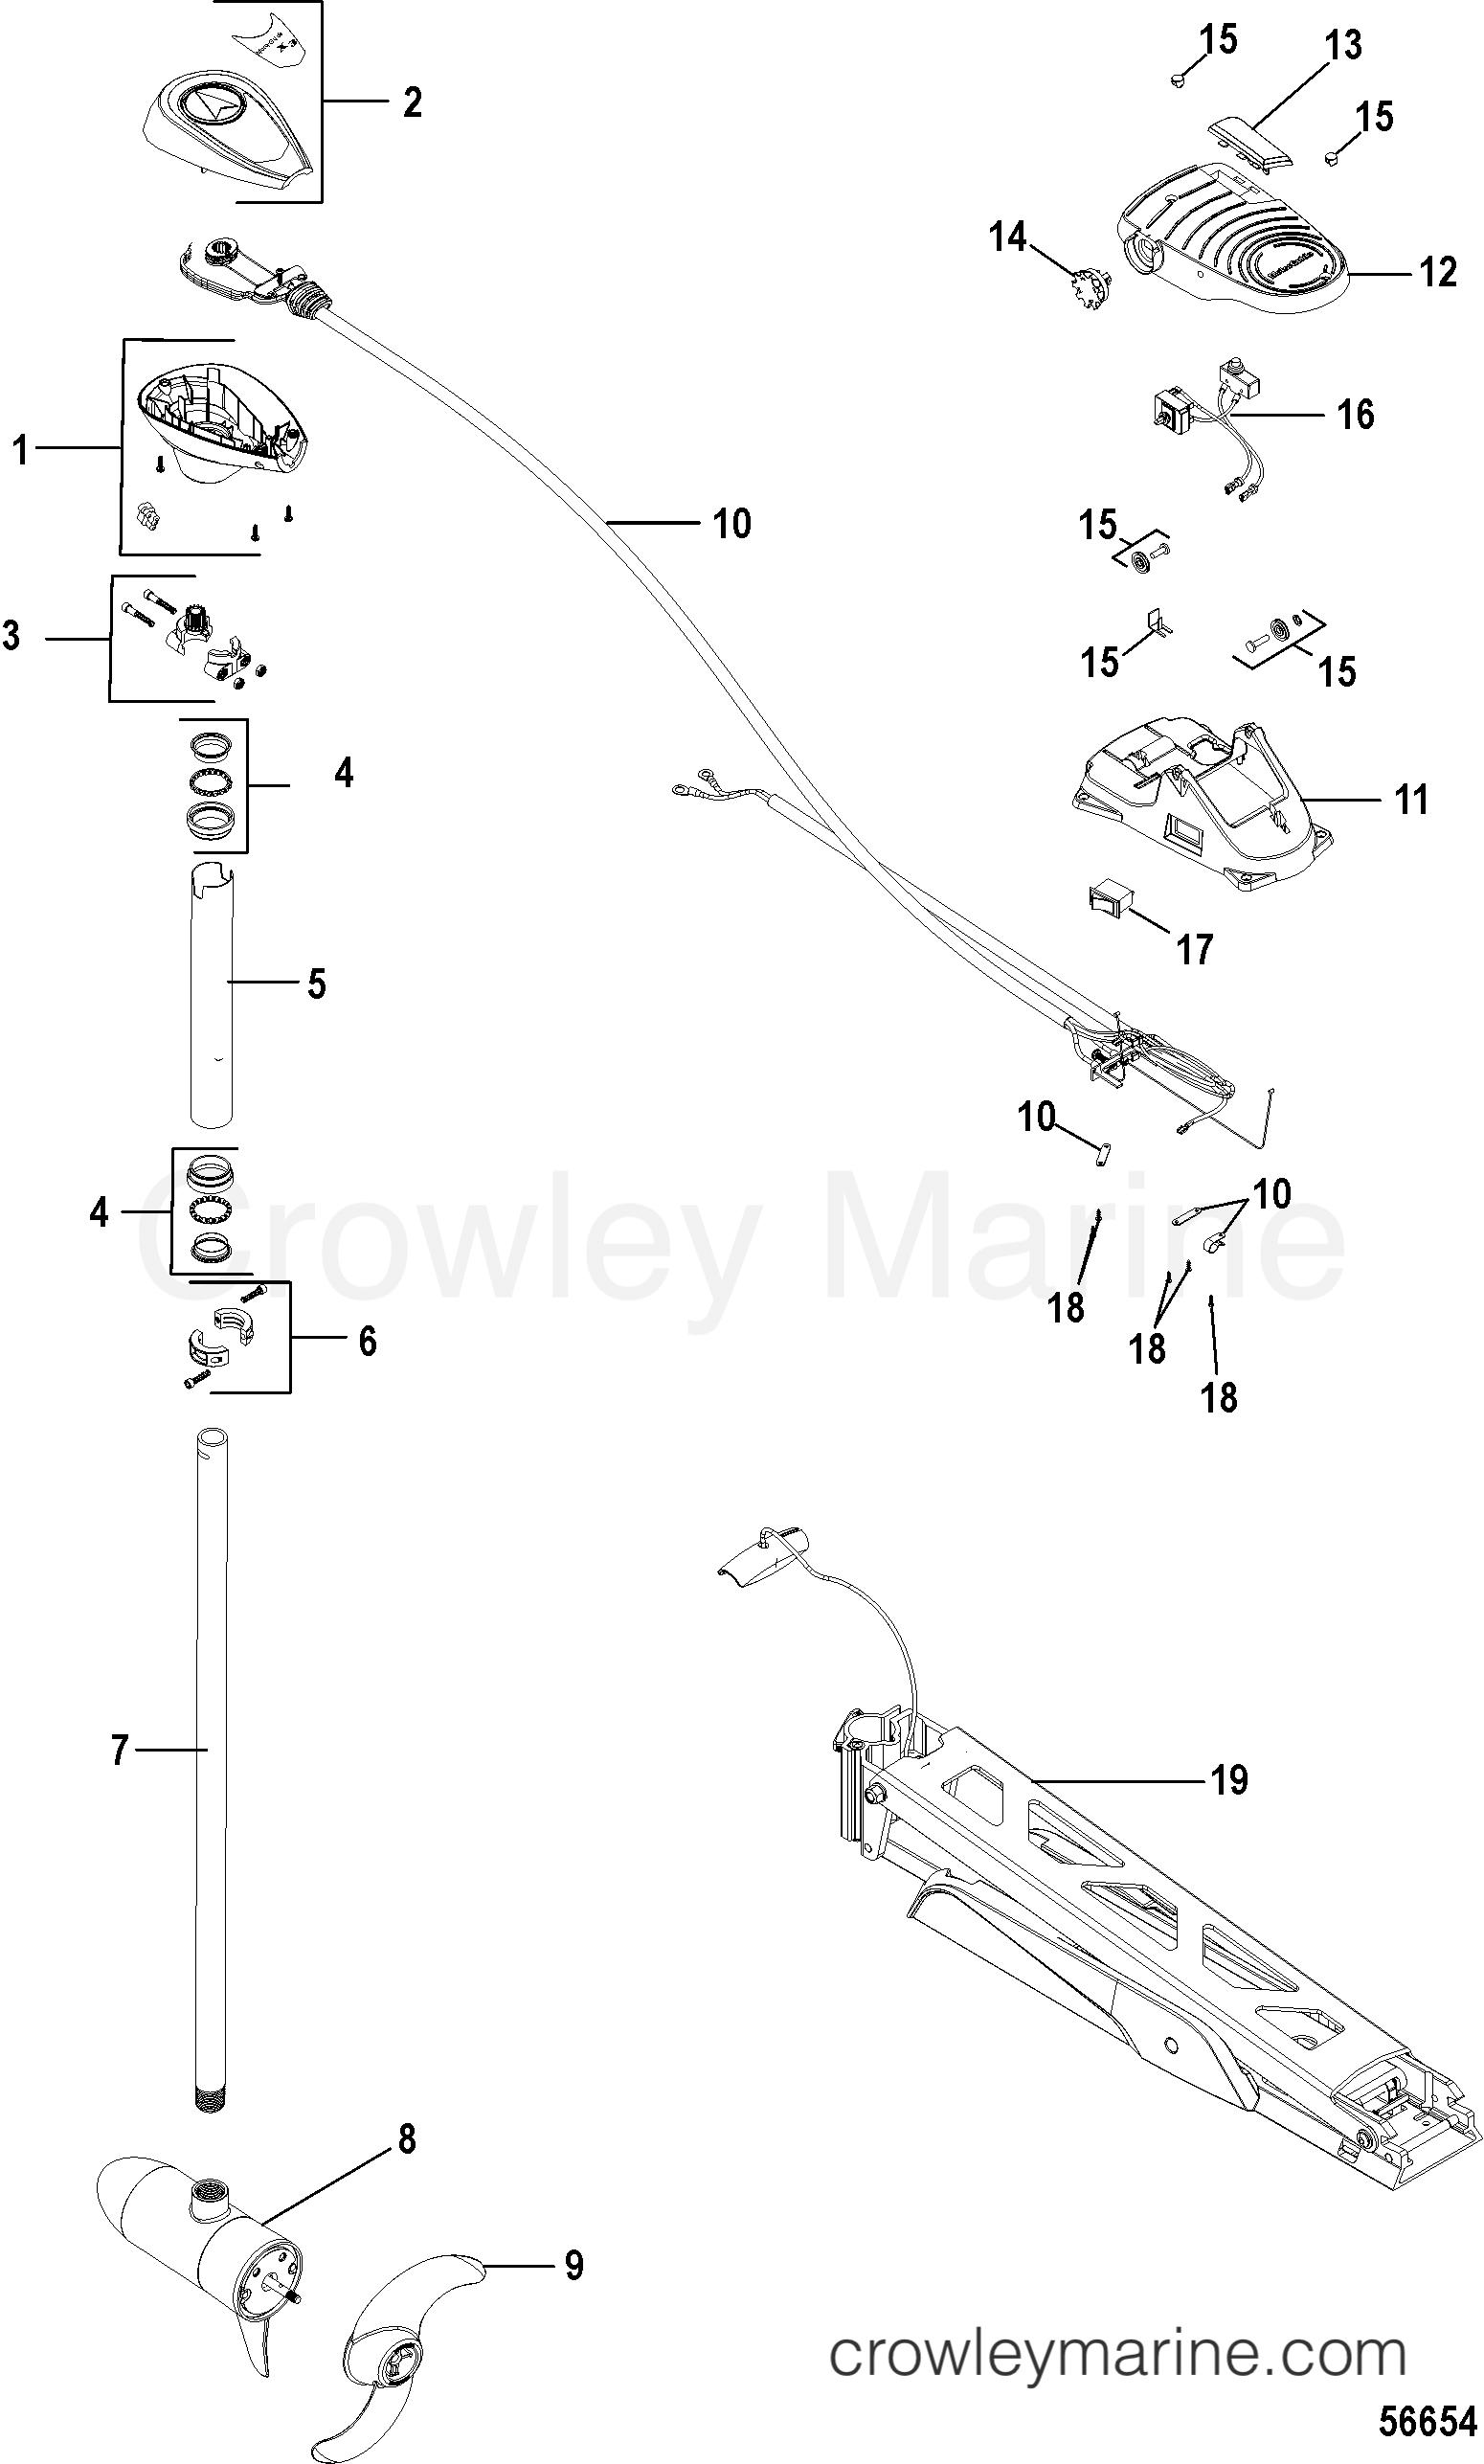 motorguide x3 wiring diagram